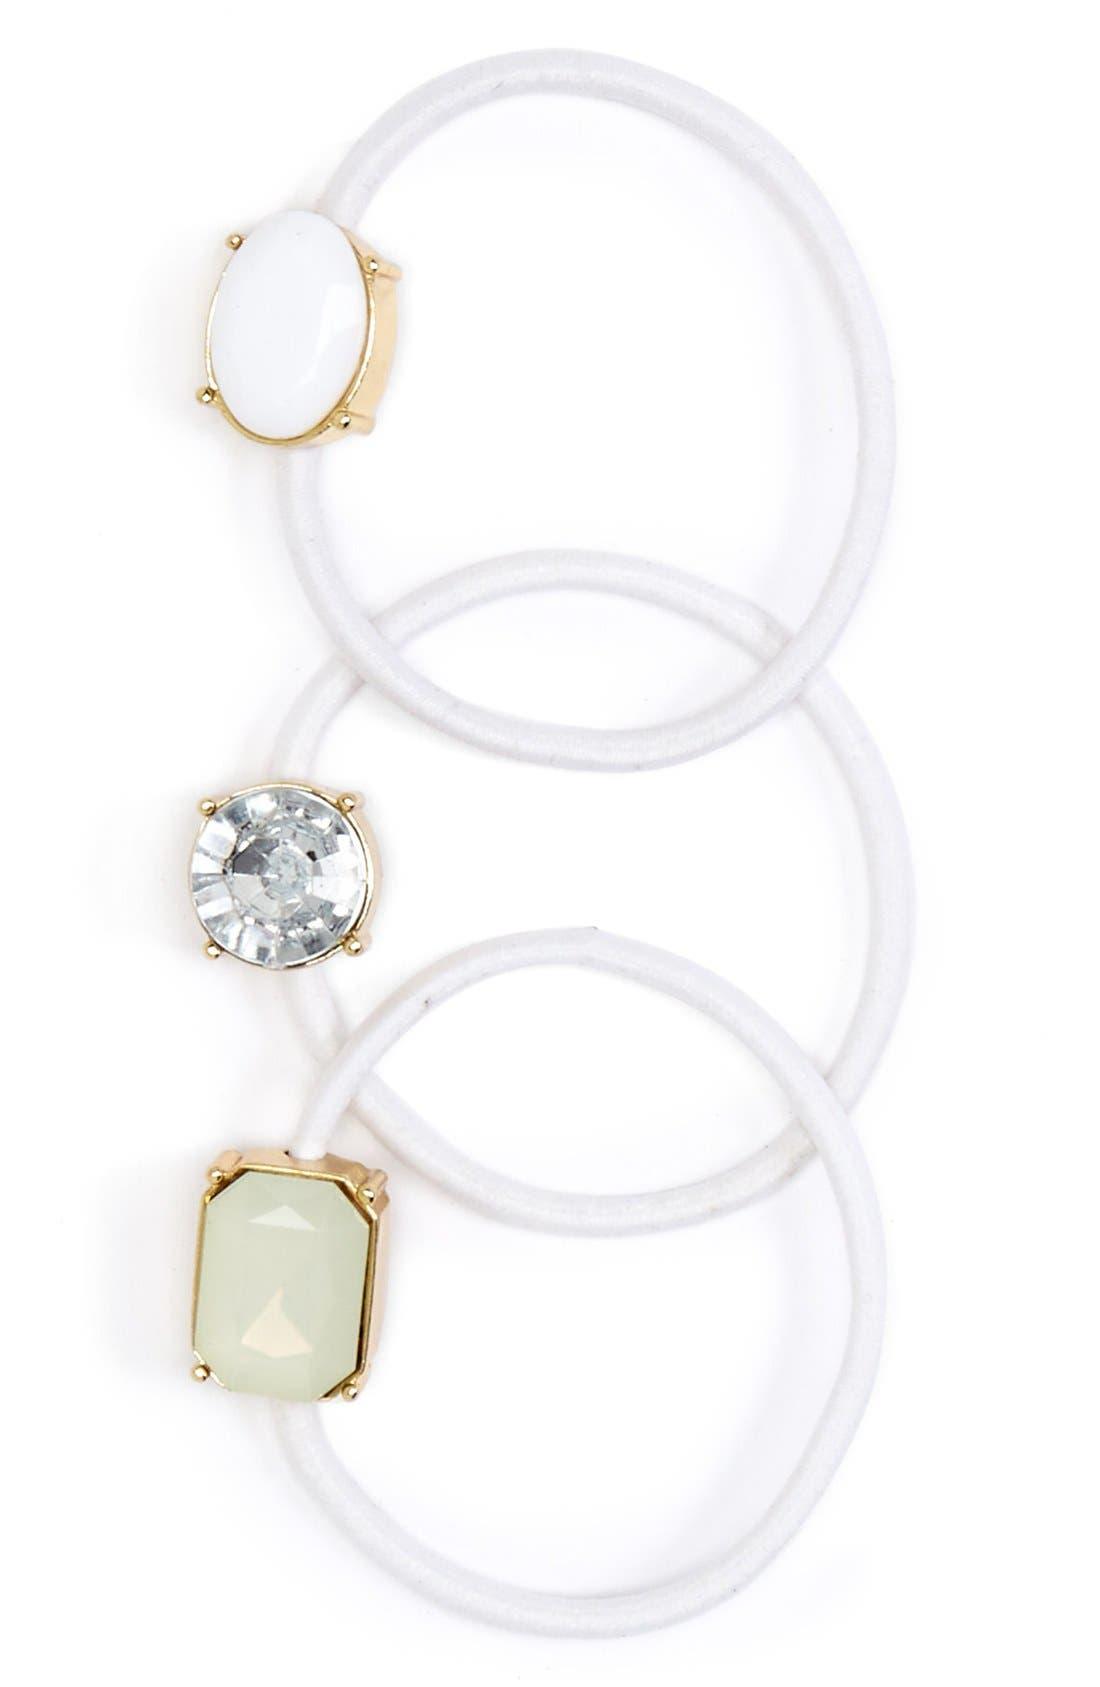 Alternate Image 1 Selected - Cara 'Bejeweled' Ponytail Holders (Set of 3)